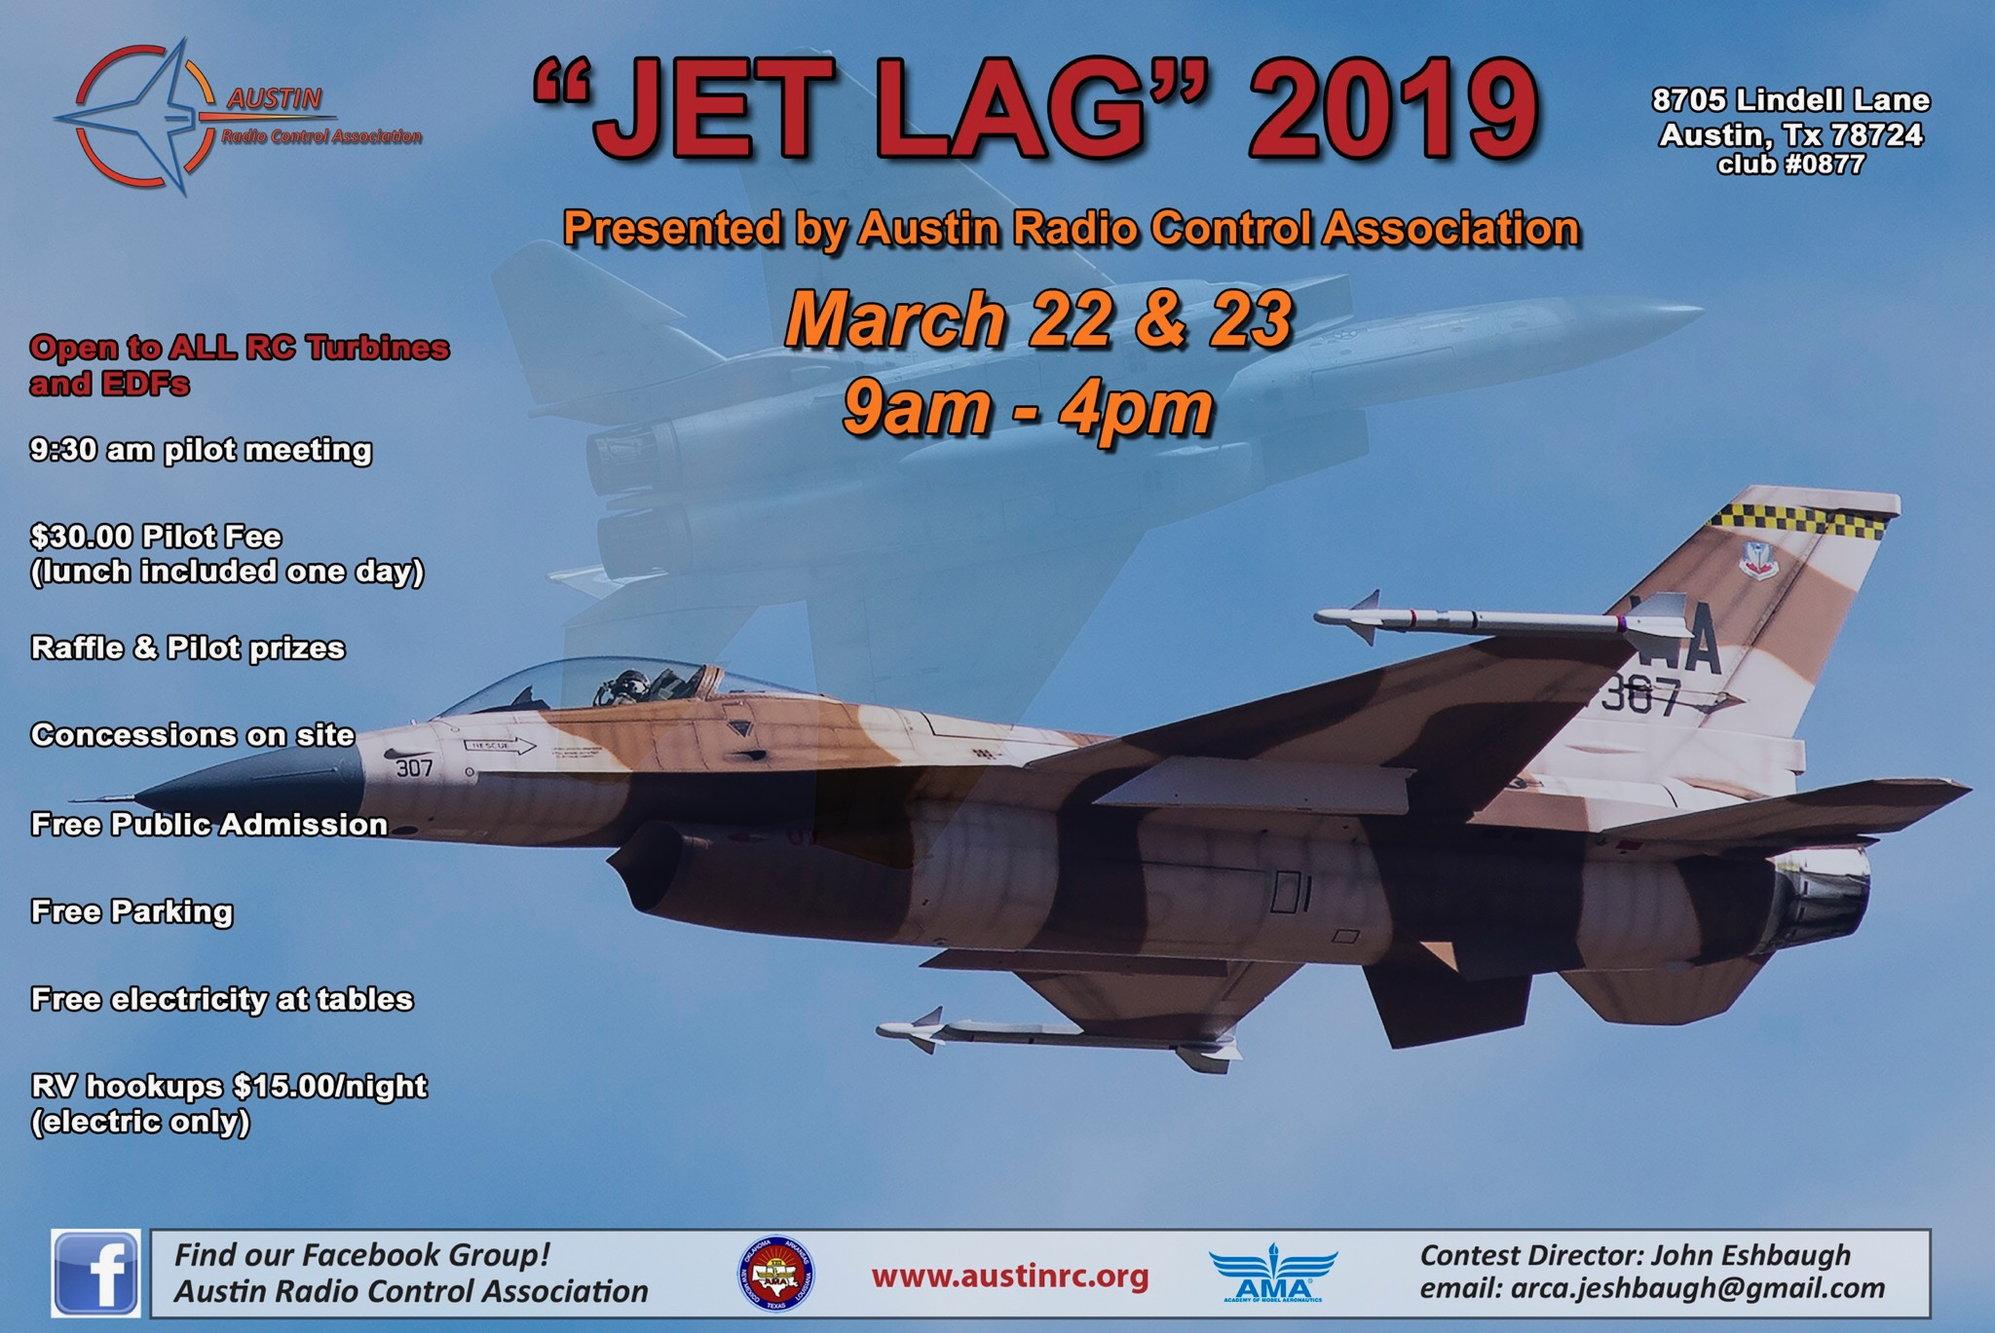 Austin Texas JET LAG jet rally March 22-23 - RCU Forums